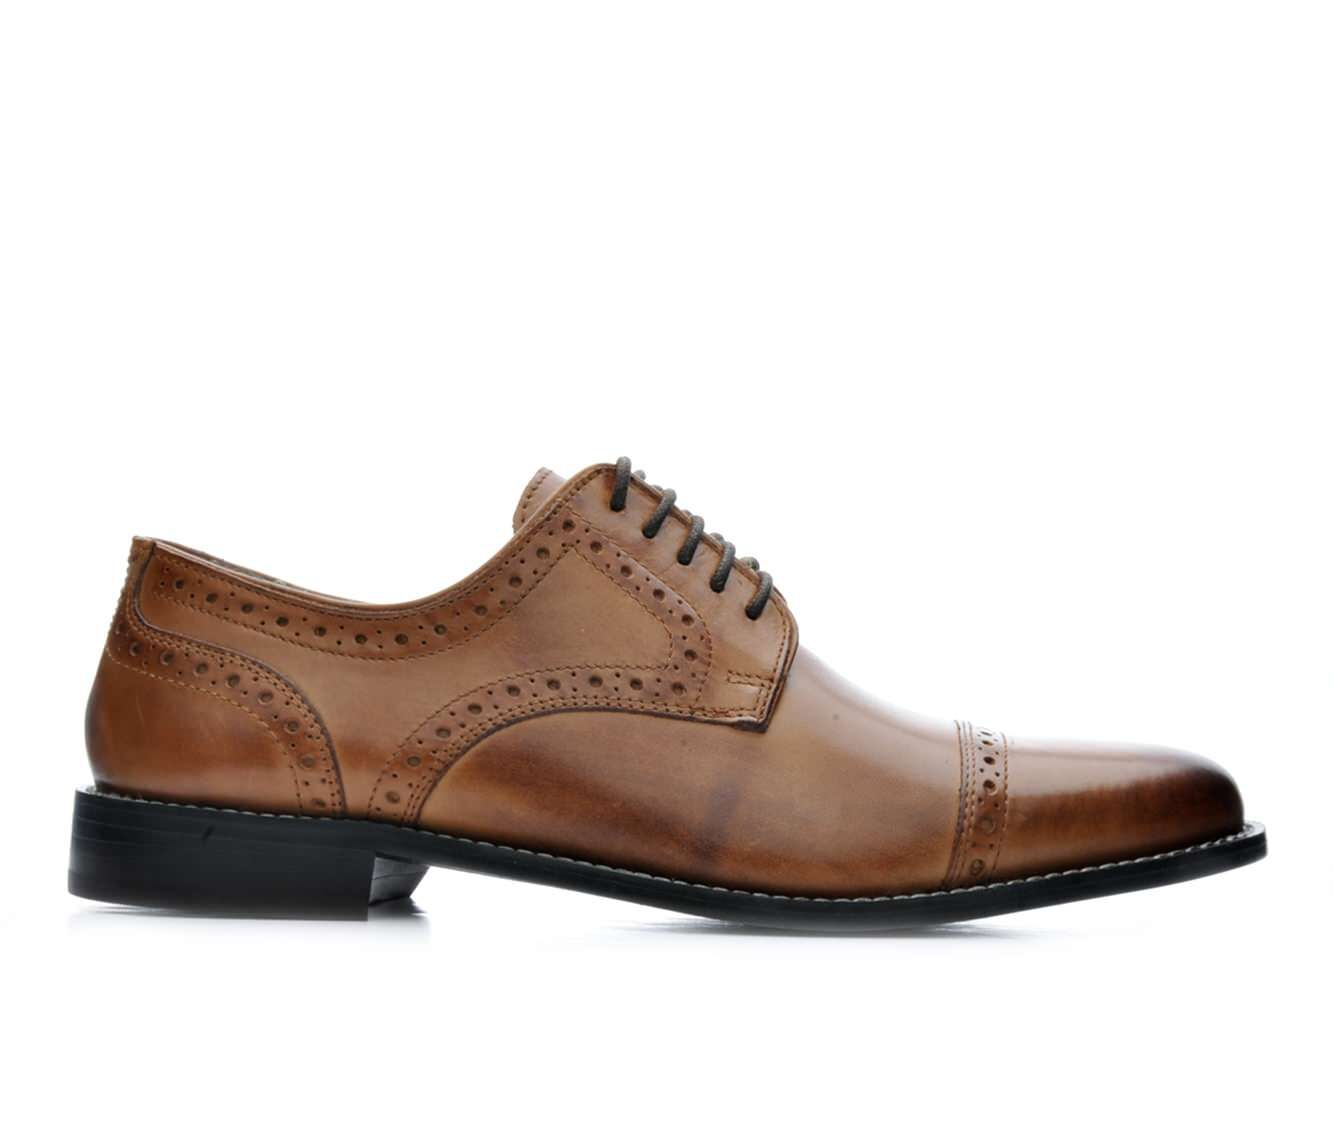 Men's Nunn Bush Norcross Cap Ox Dress Shoes Cognac